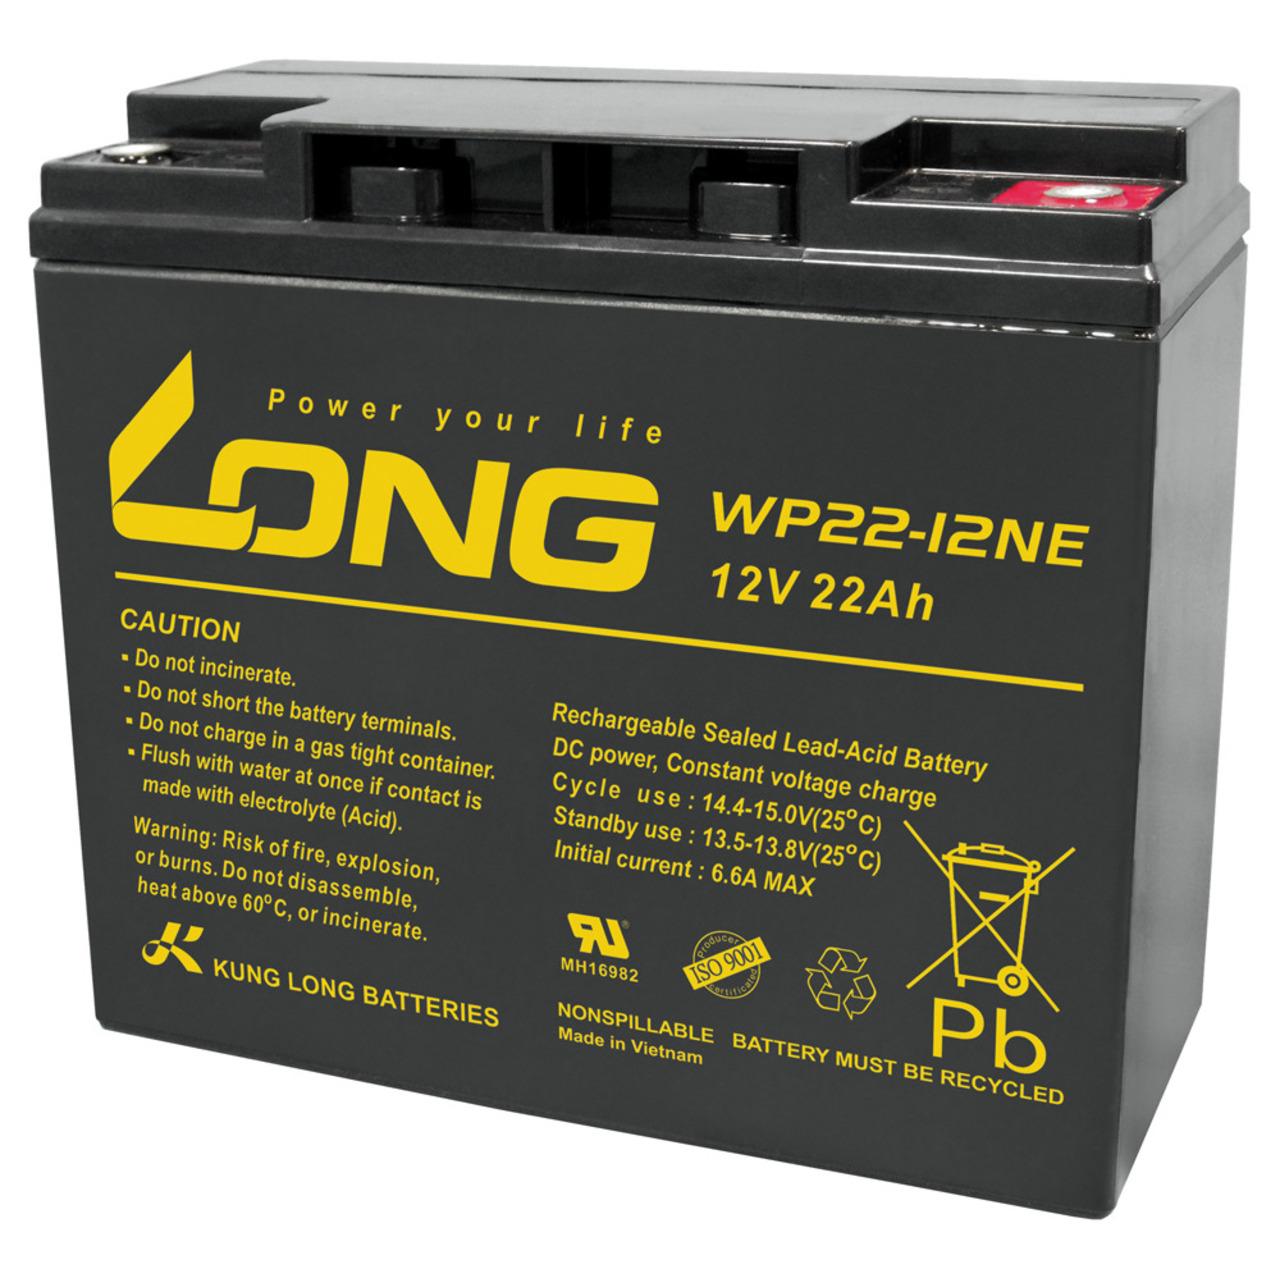 Kung Long Blei-Vlies-Akku WP22-12NE- 12 V- 22 Ah- zyklenfest